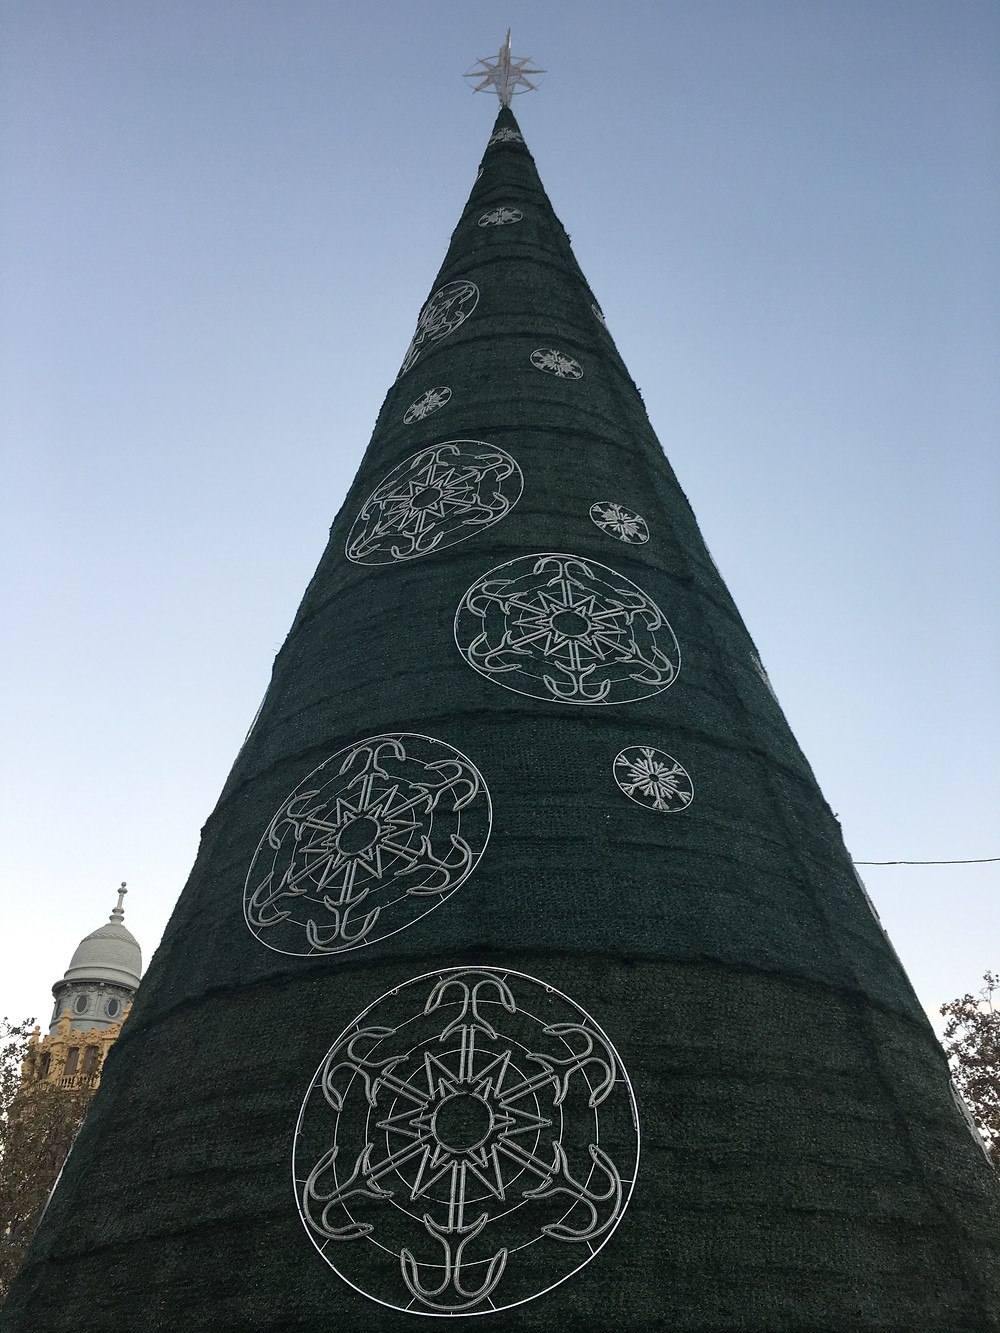 Arbol de navidad Christmas Tree